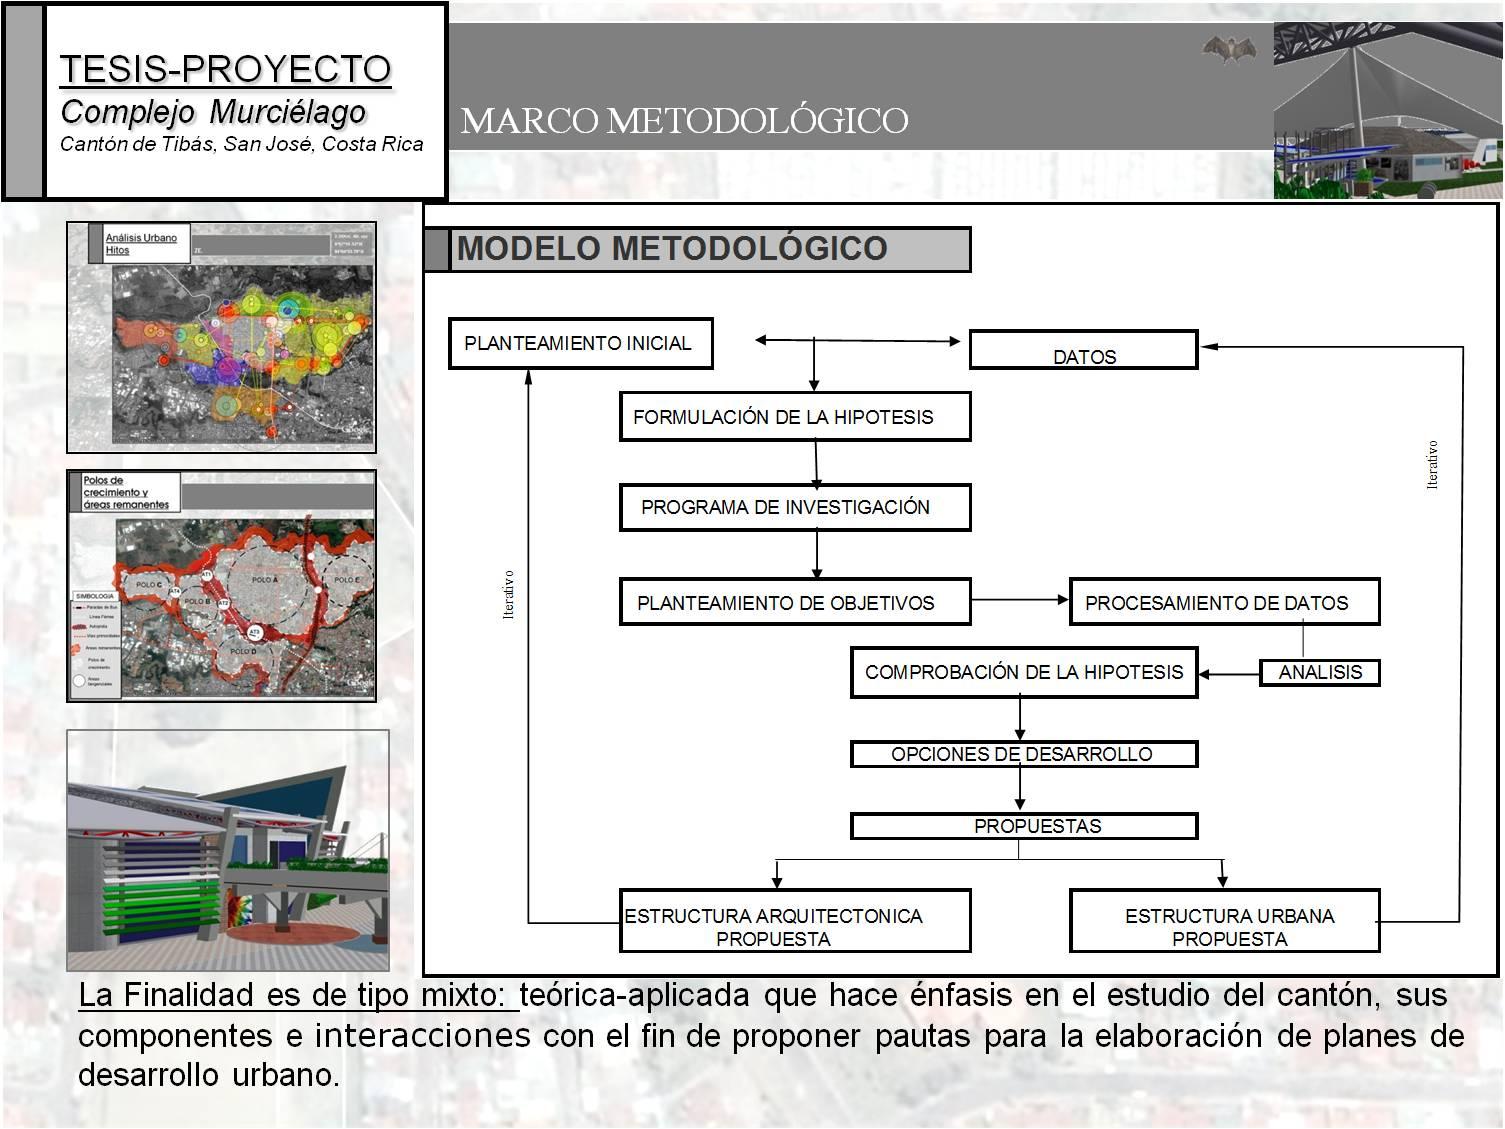 Tesis de arquitectura complejo murcielago tesis de for Tesis de arquitectura ejemplos